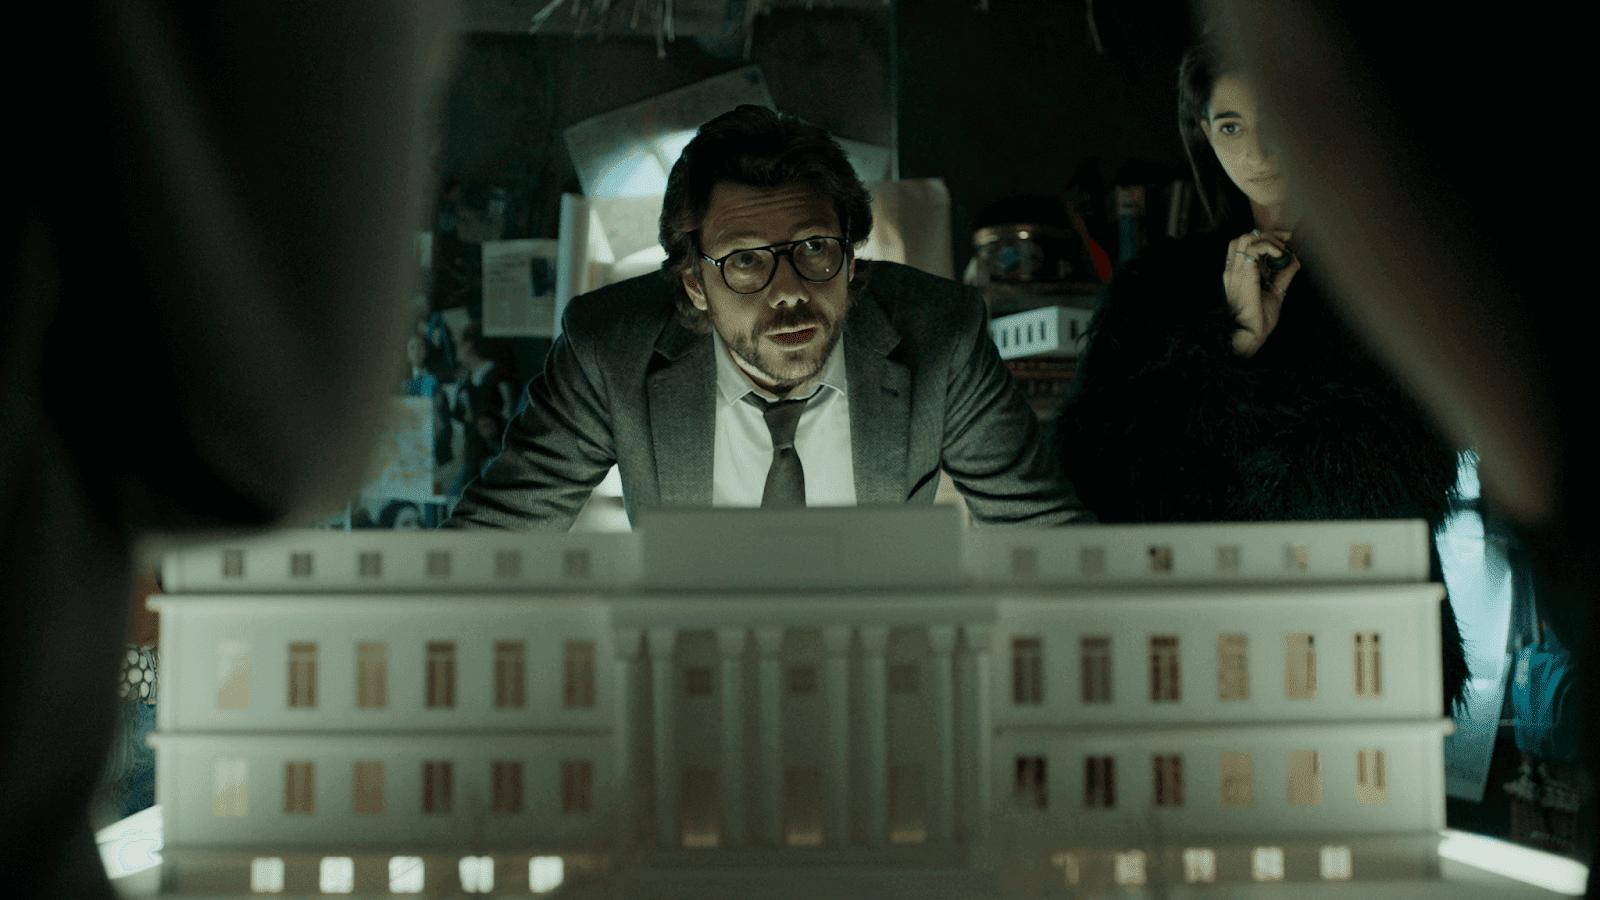 La Casa De Papel Season 4: What to expect?